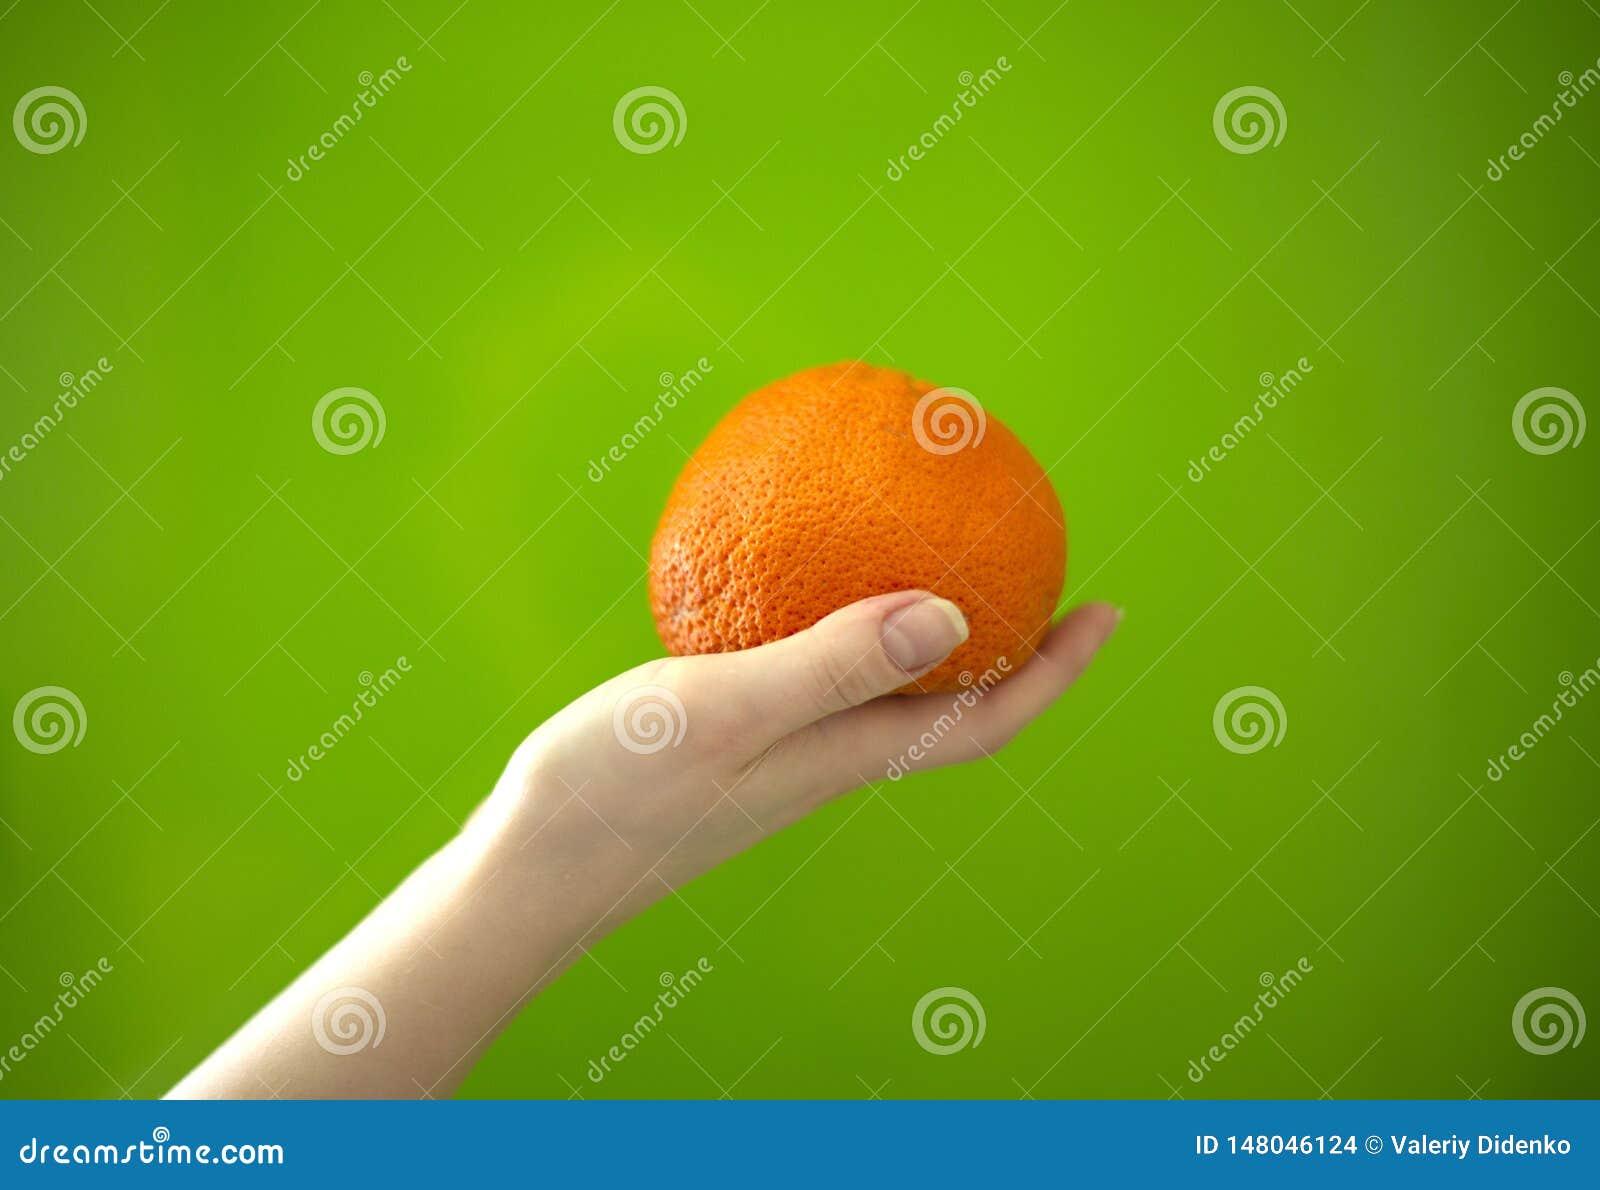 Mandarine à disposition sur un fond vert